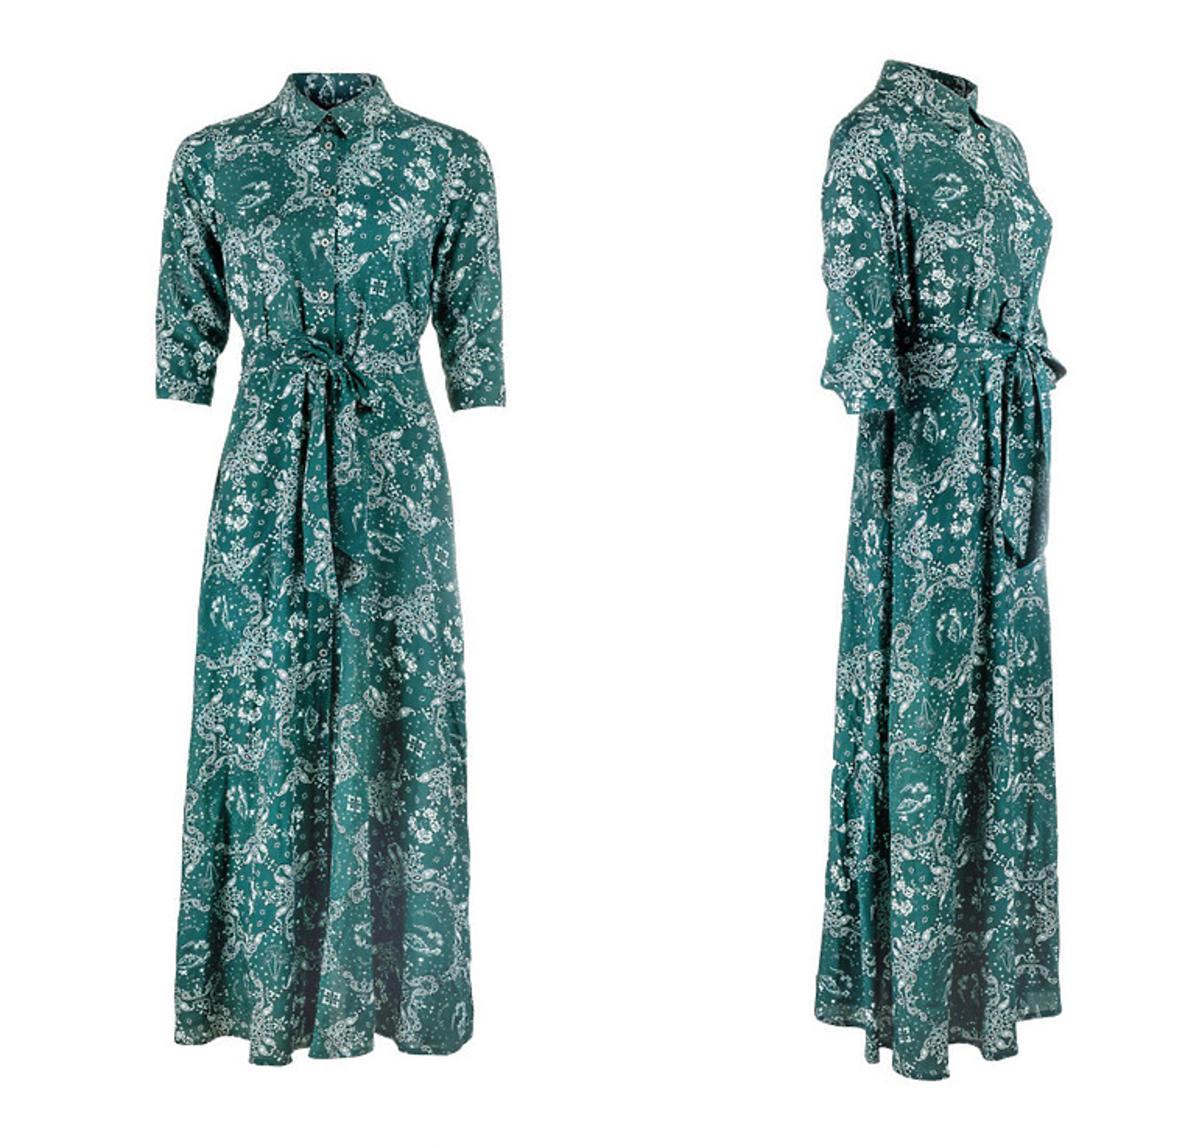 Sukienka koszulowa maxi, Beksa, 299 zł